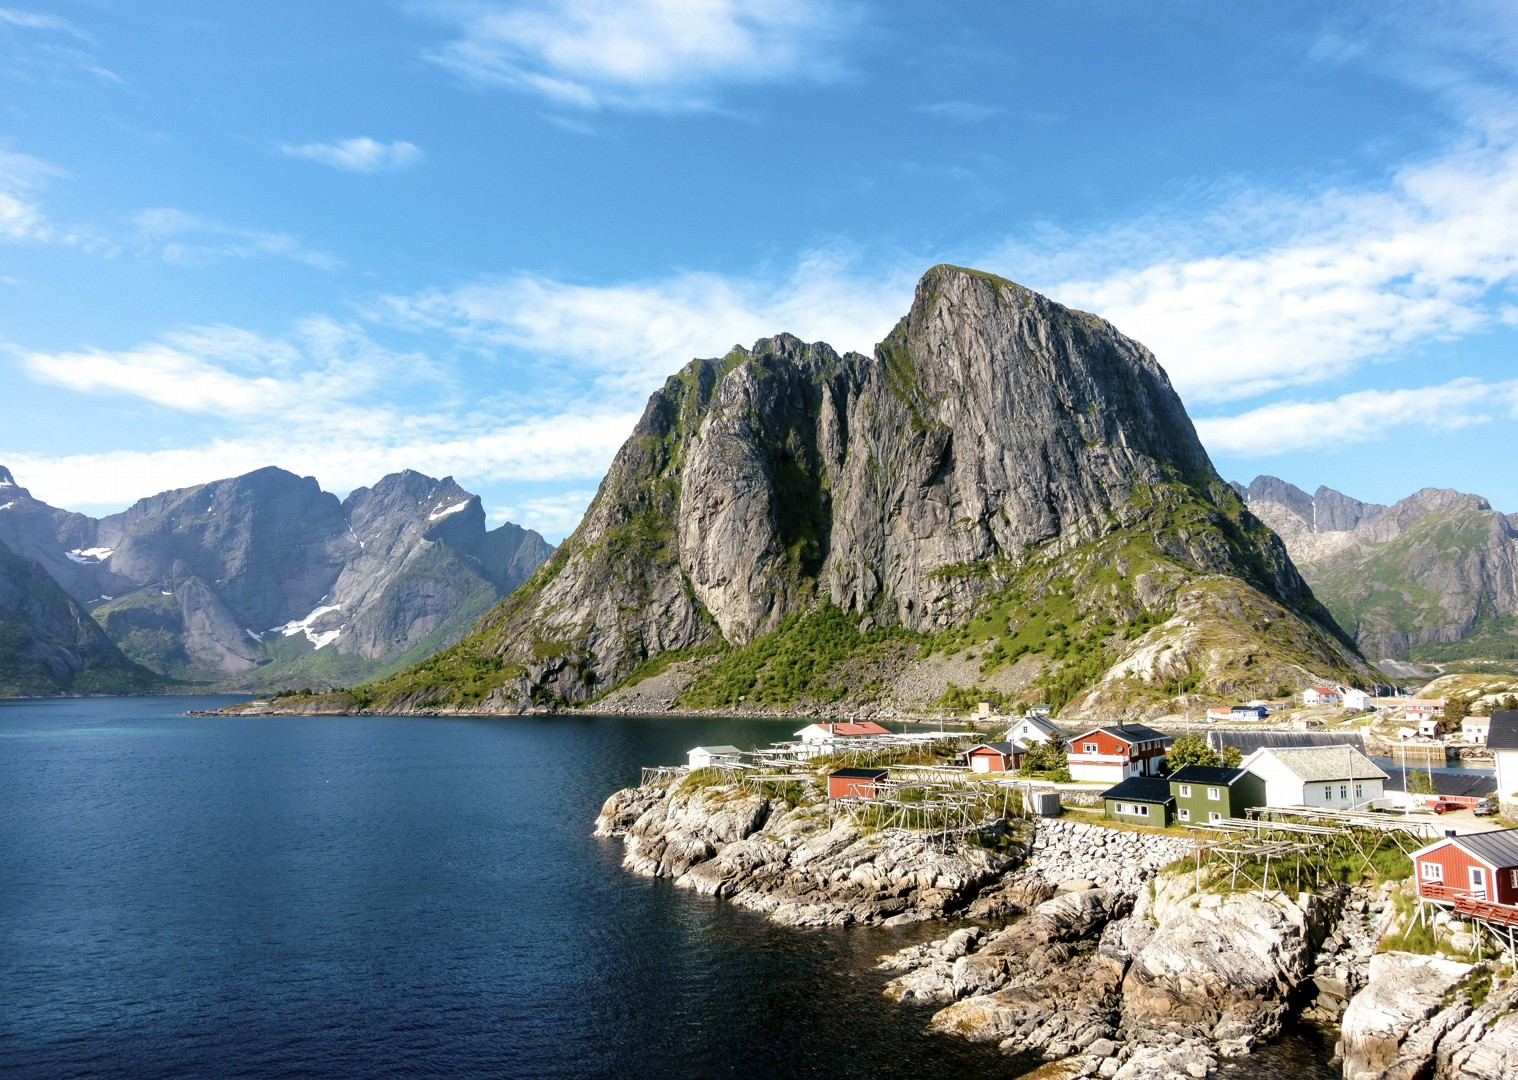 leisure-cycling-holiday-norway-lofoten.jpg - Norway - Lofoten Islands - Self-Guided Leisure Cycling Holiday - Leisure Cycling